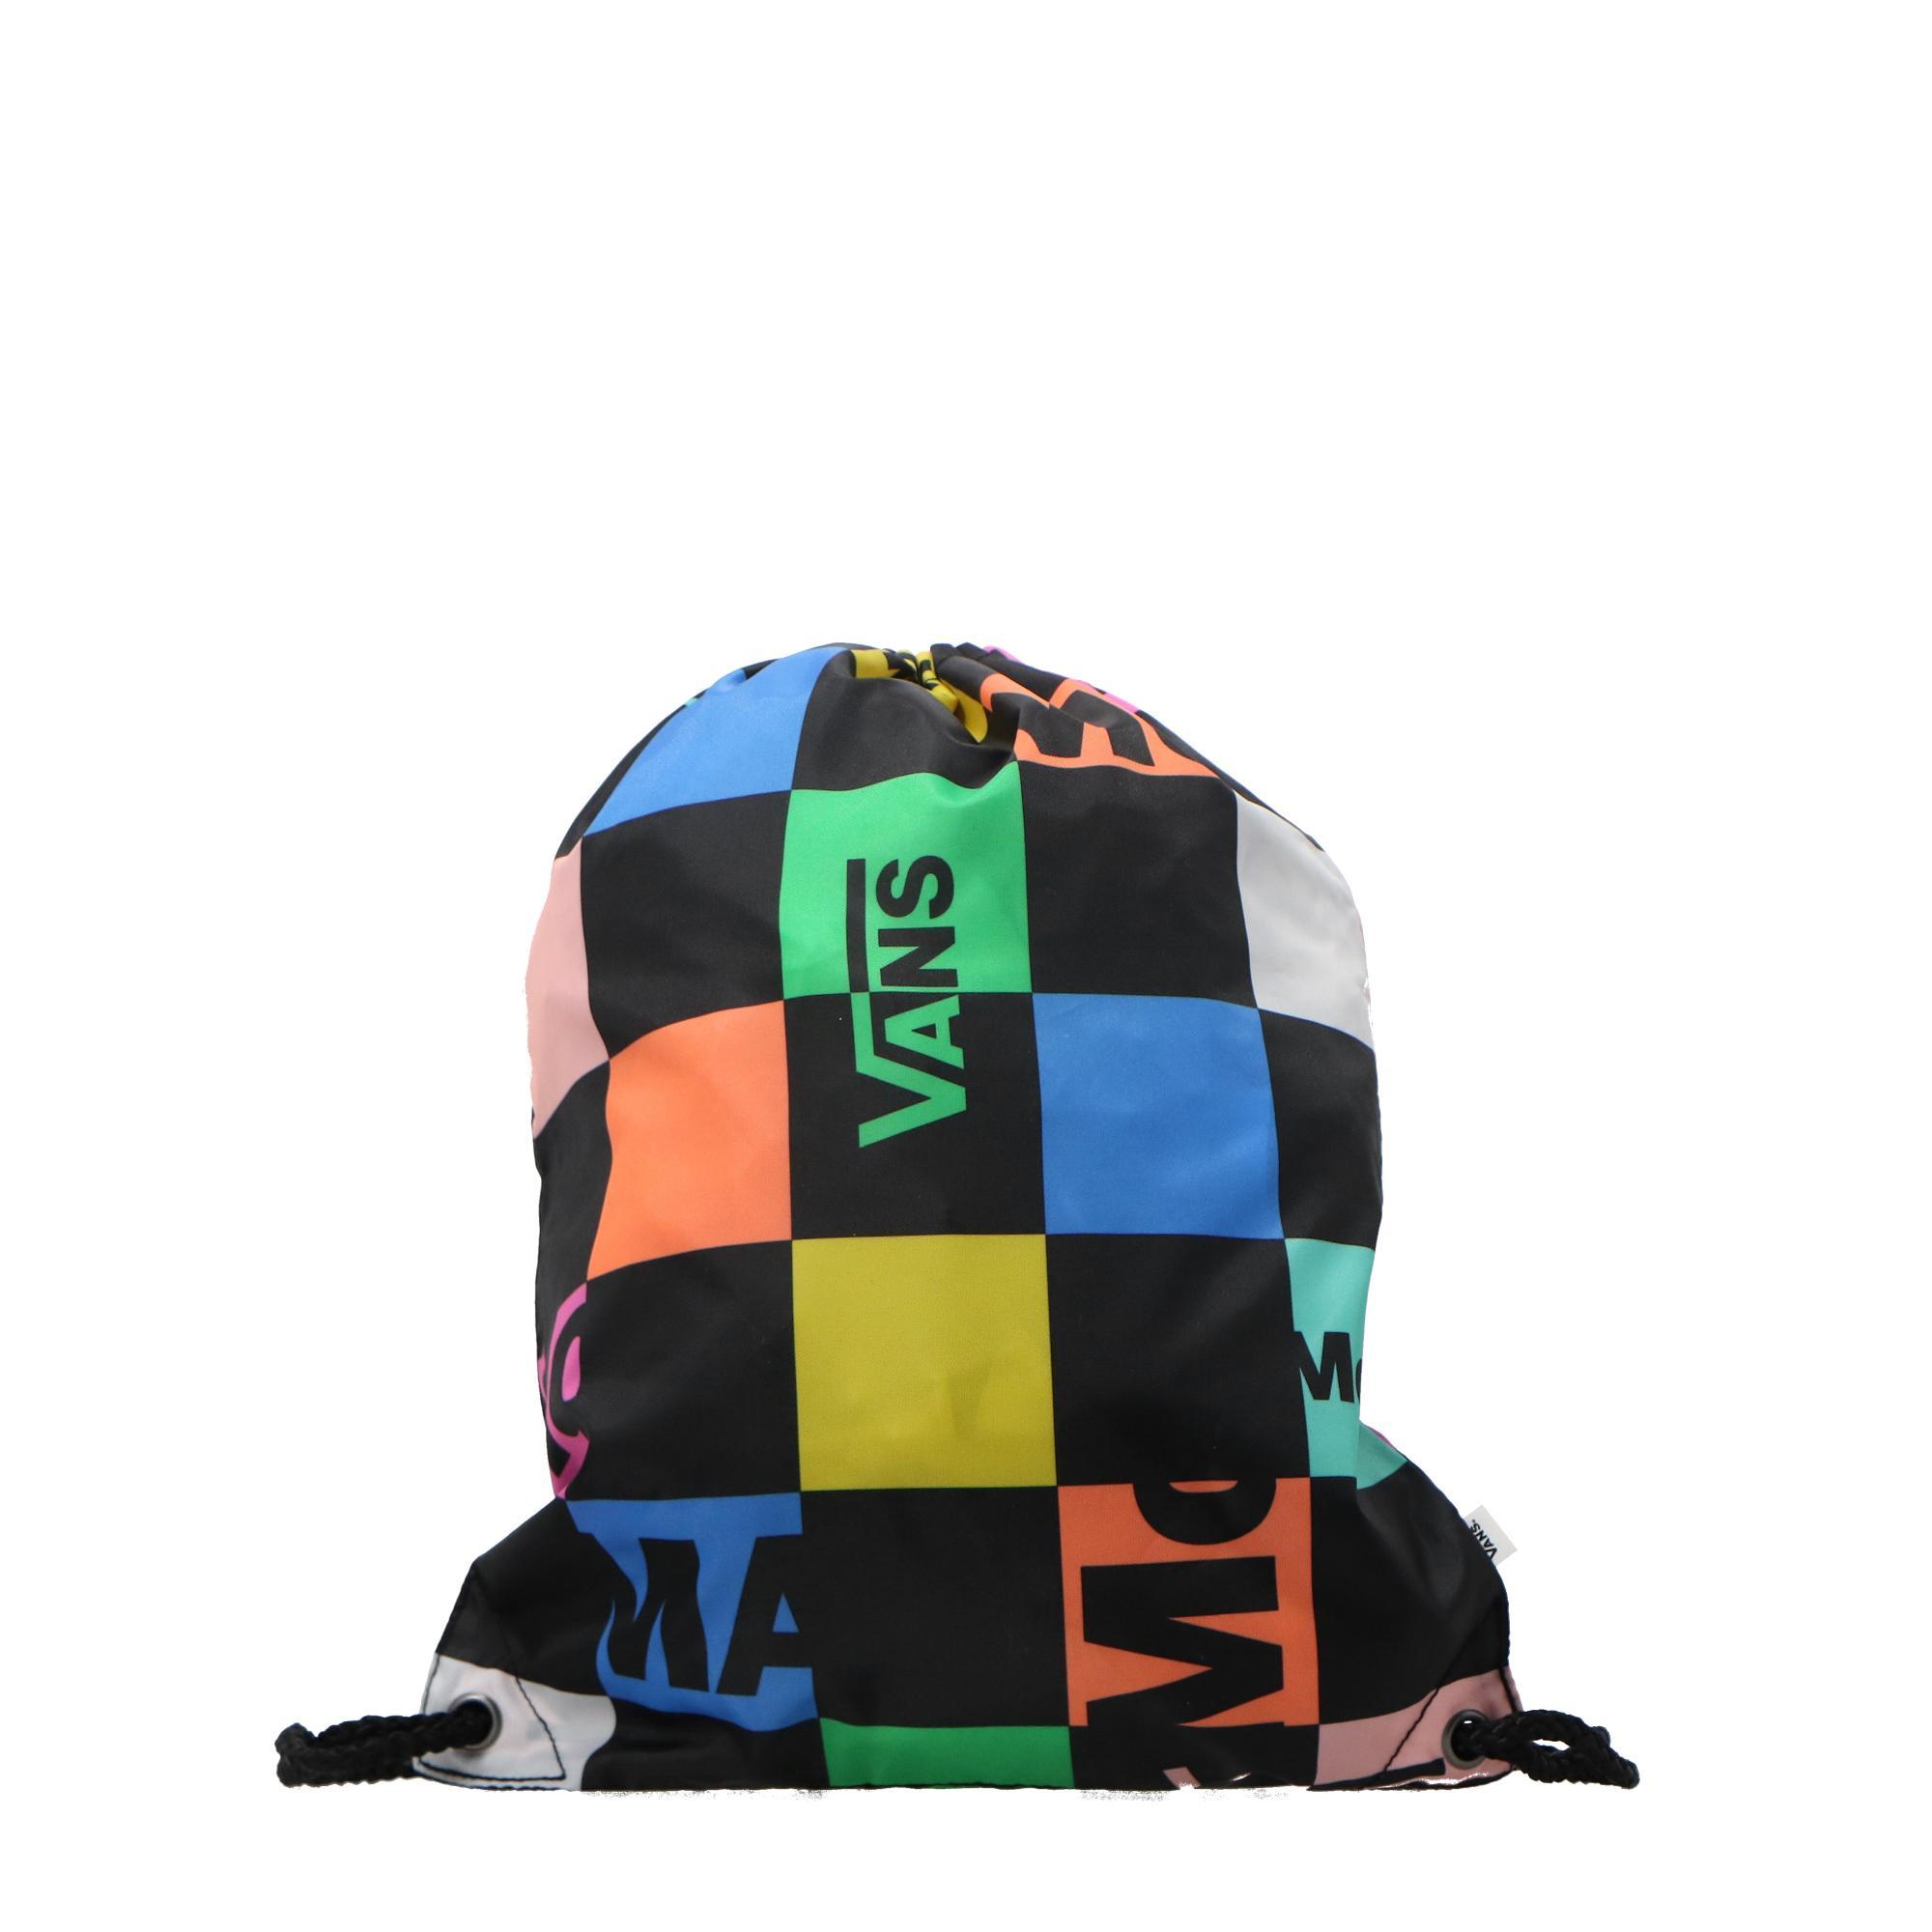 Vans X Moma Bench Bag Moma brand black